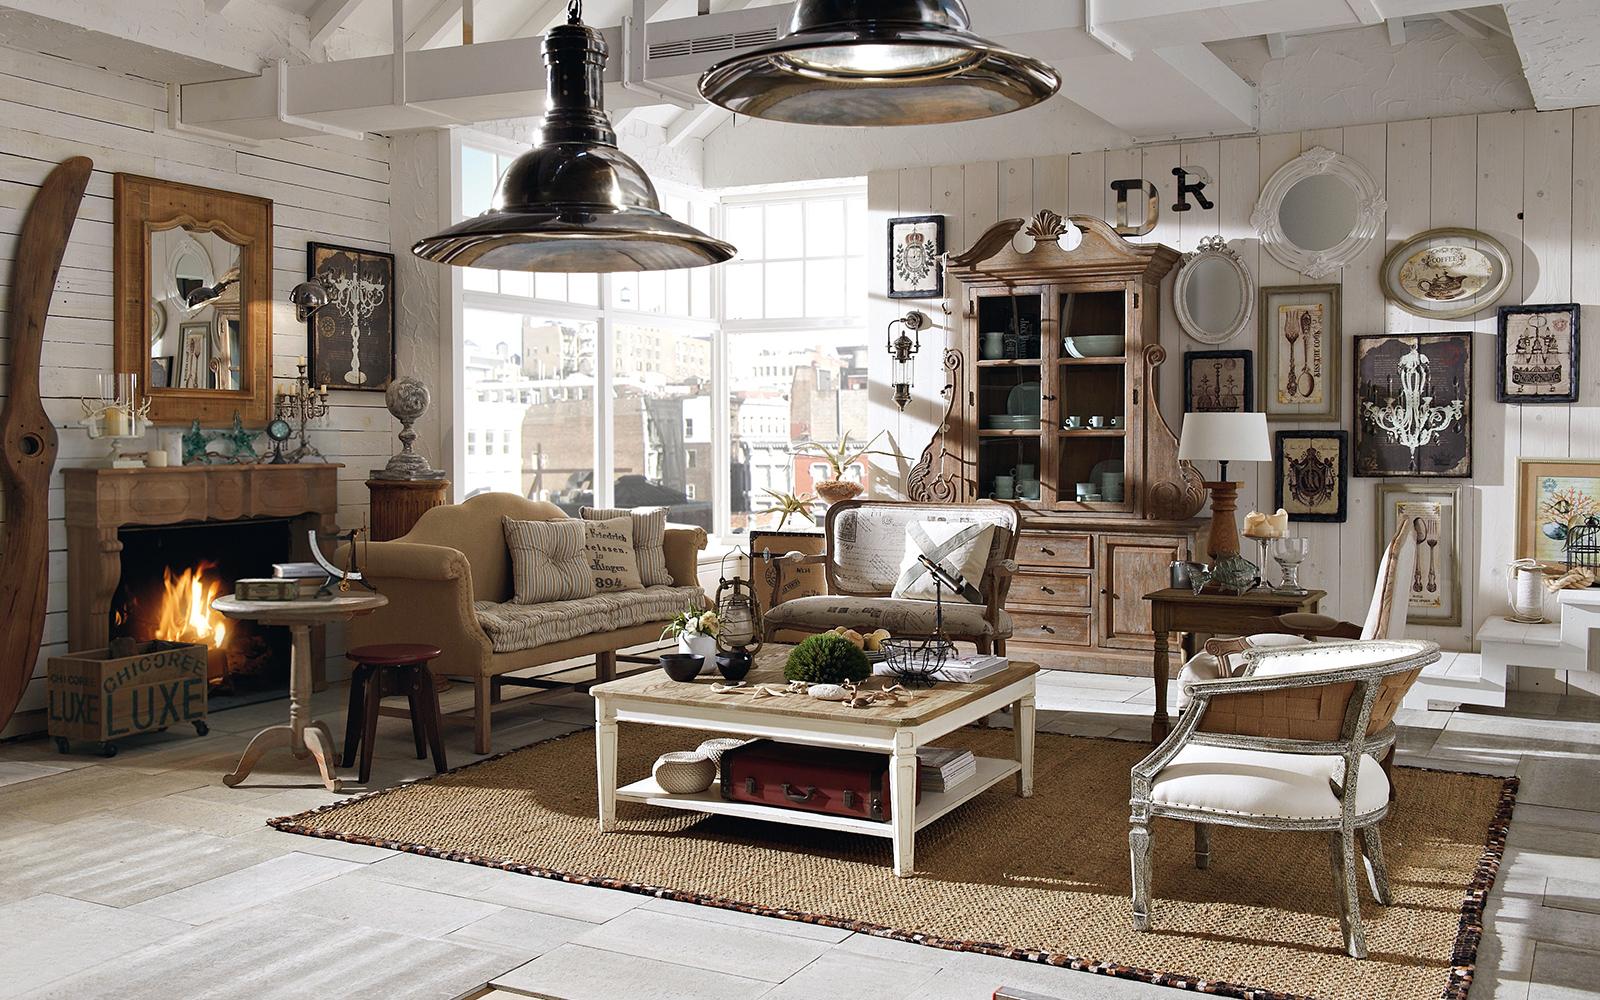 Современный интерьер квартиры в стиле кантри